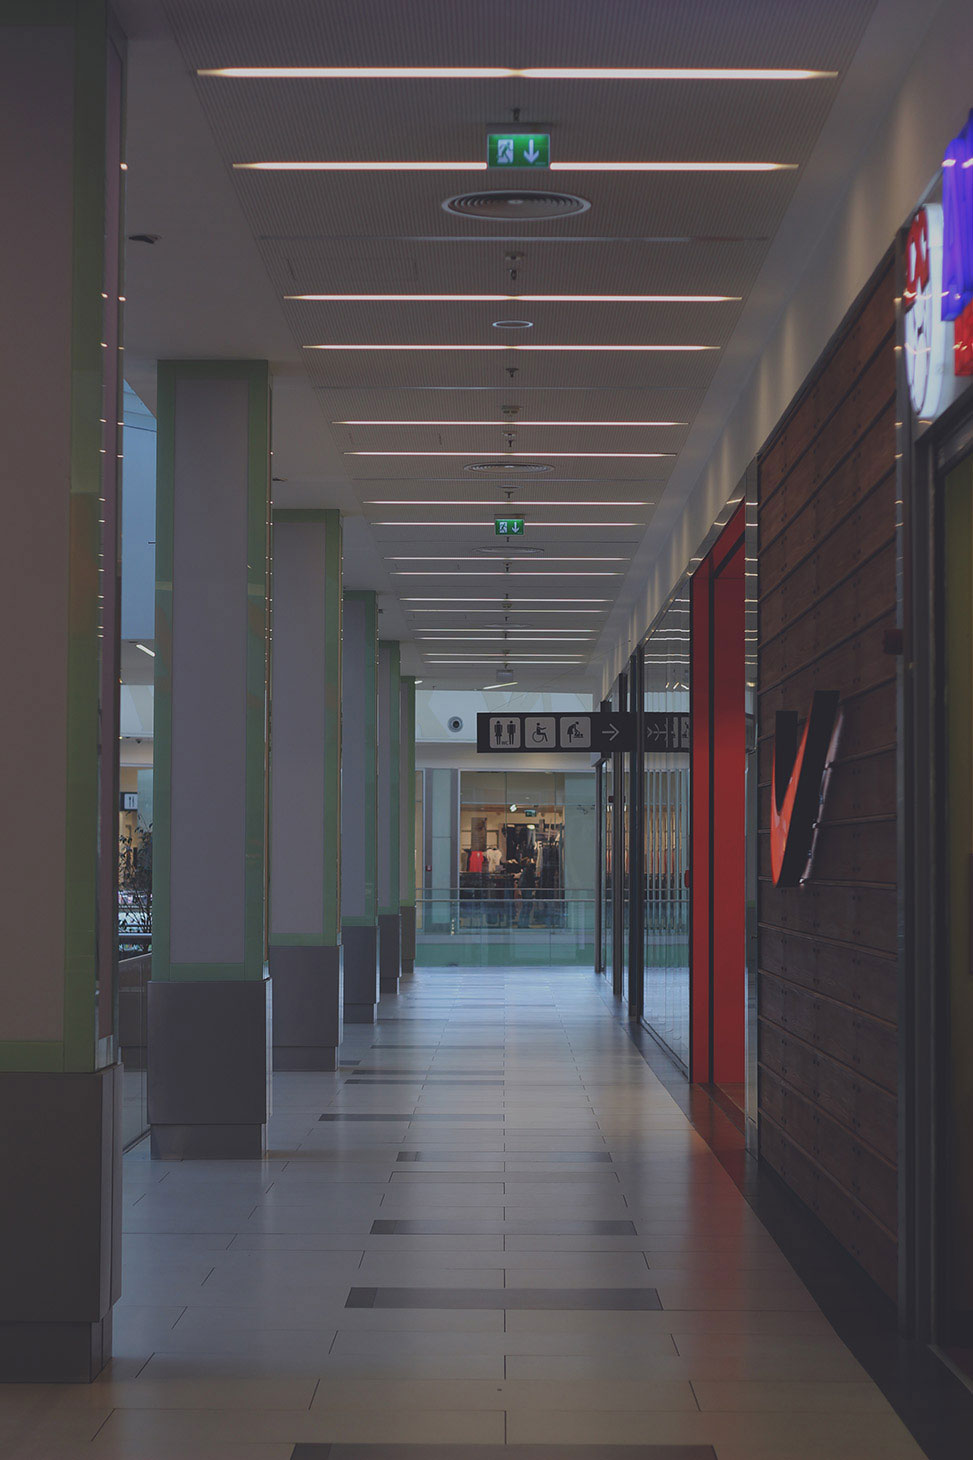 Plaza Mall Kragujevac, Serbia